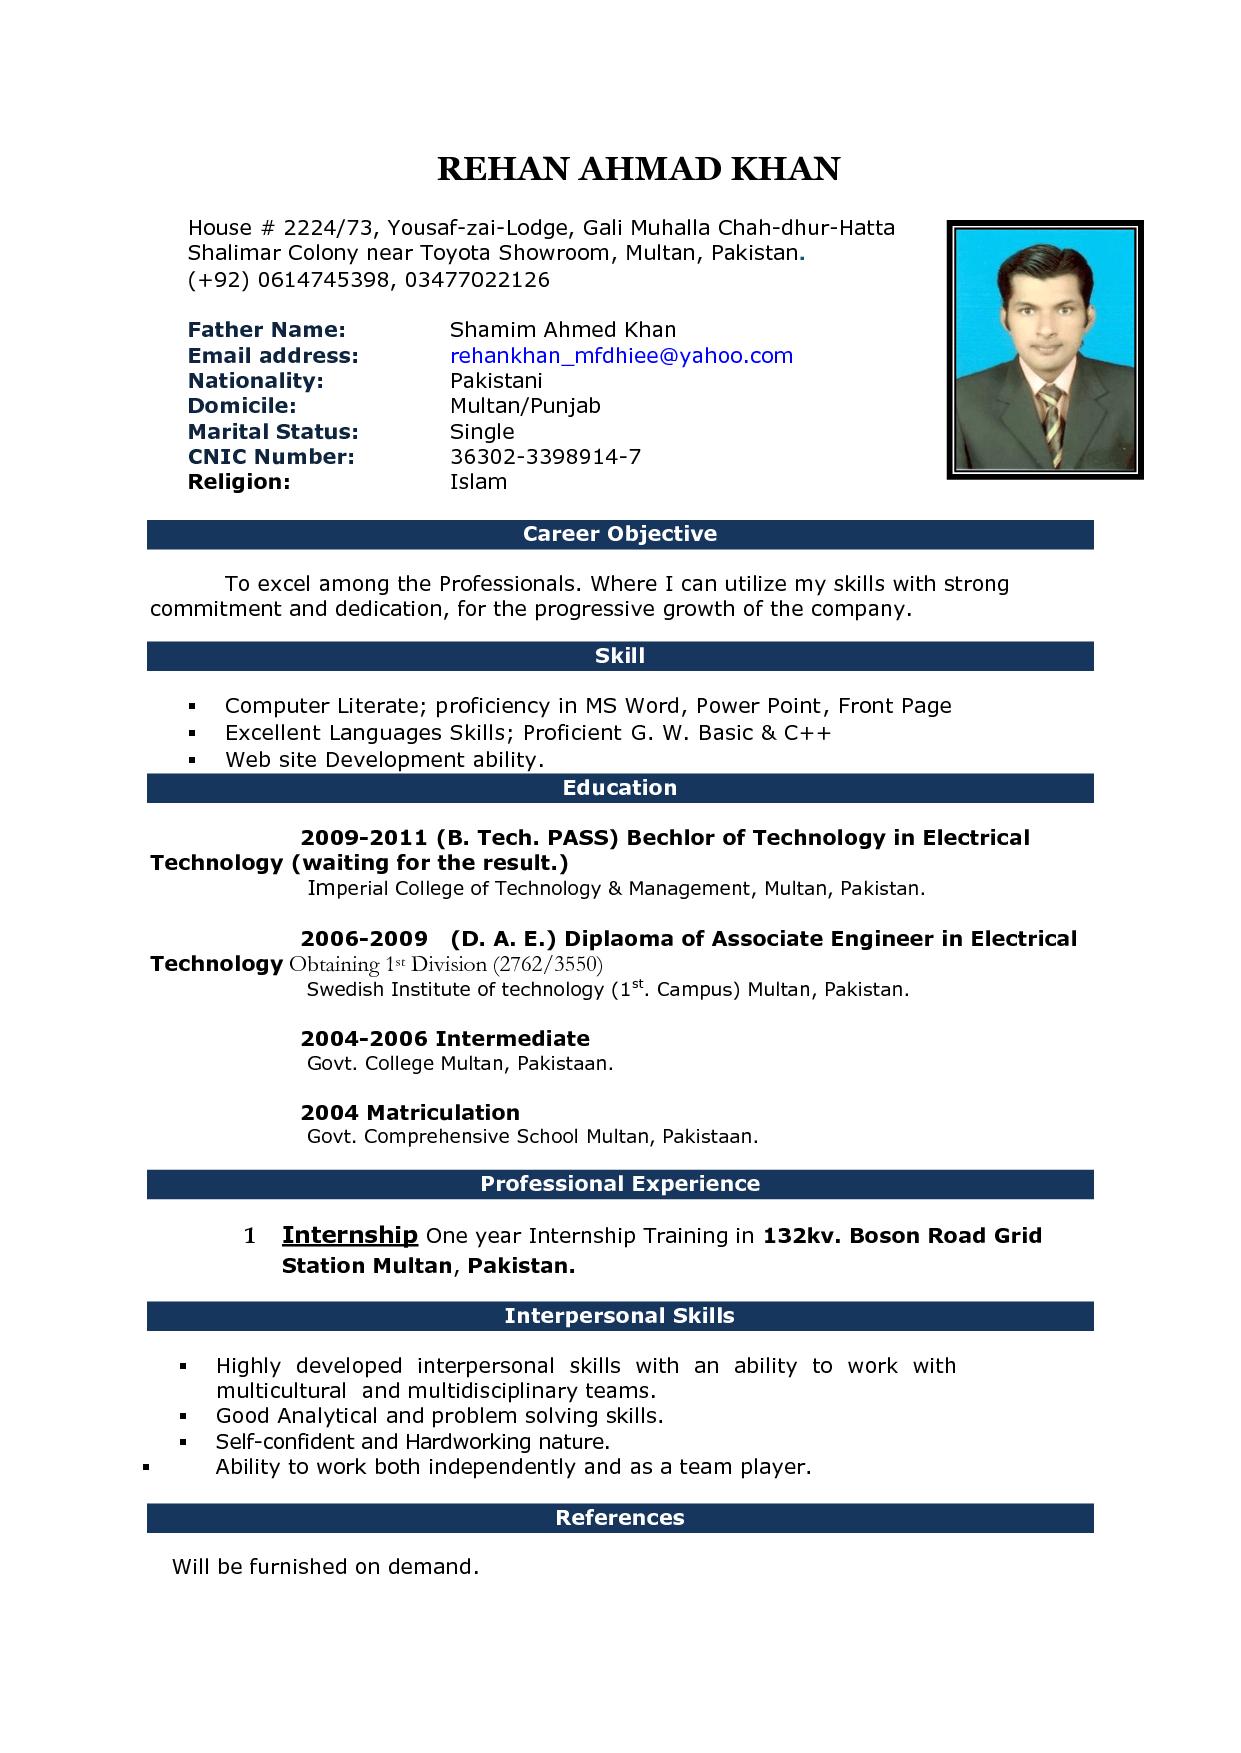 004 Curriculum Vitae Templates Microsoft Word Cv Pattern 2 Regarding Resume Templates Word 2010